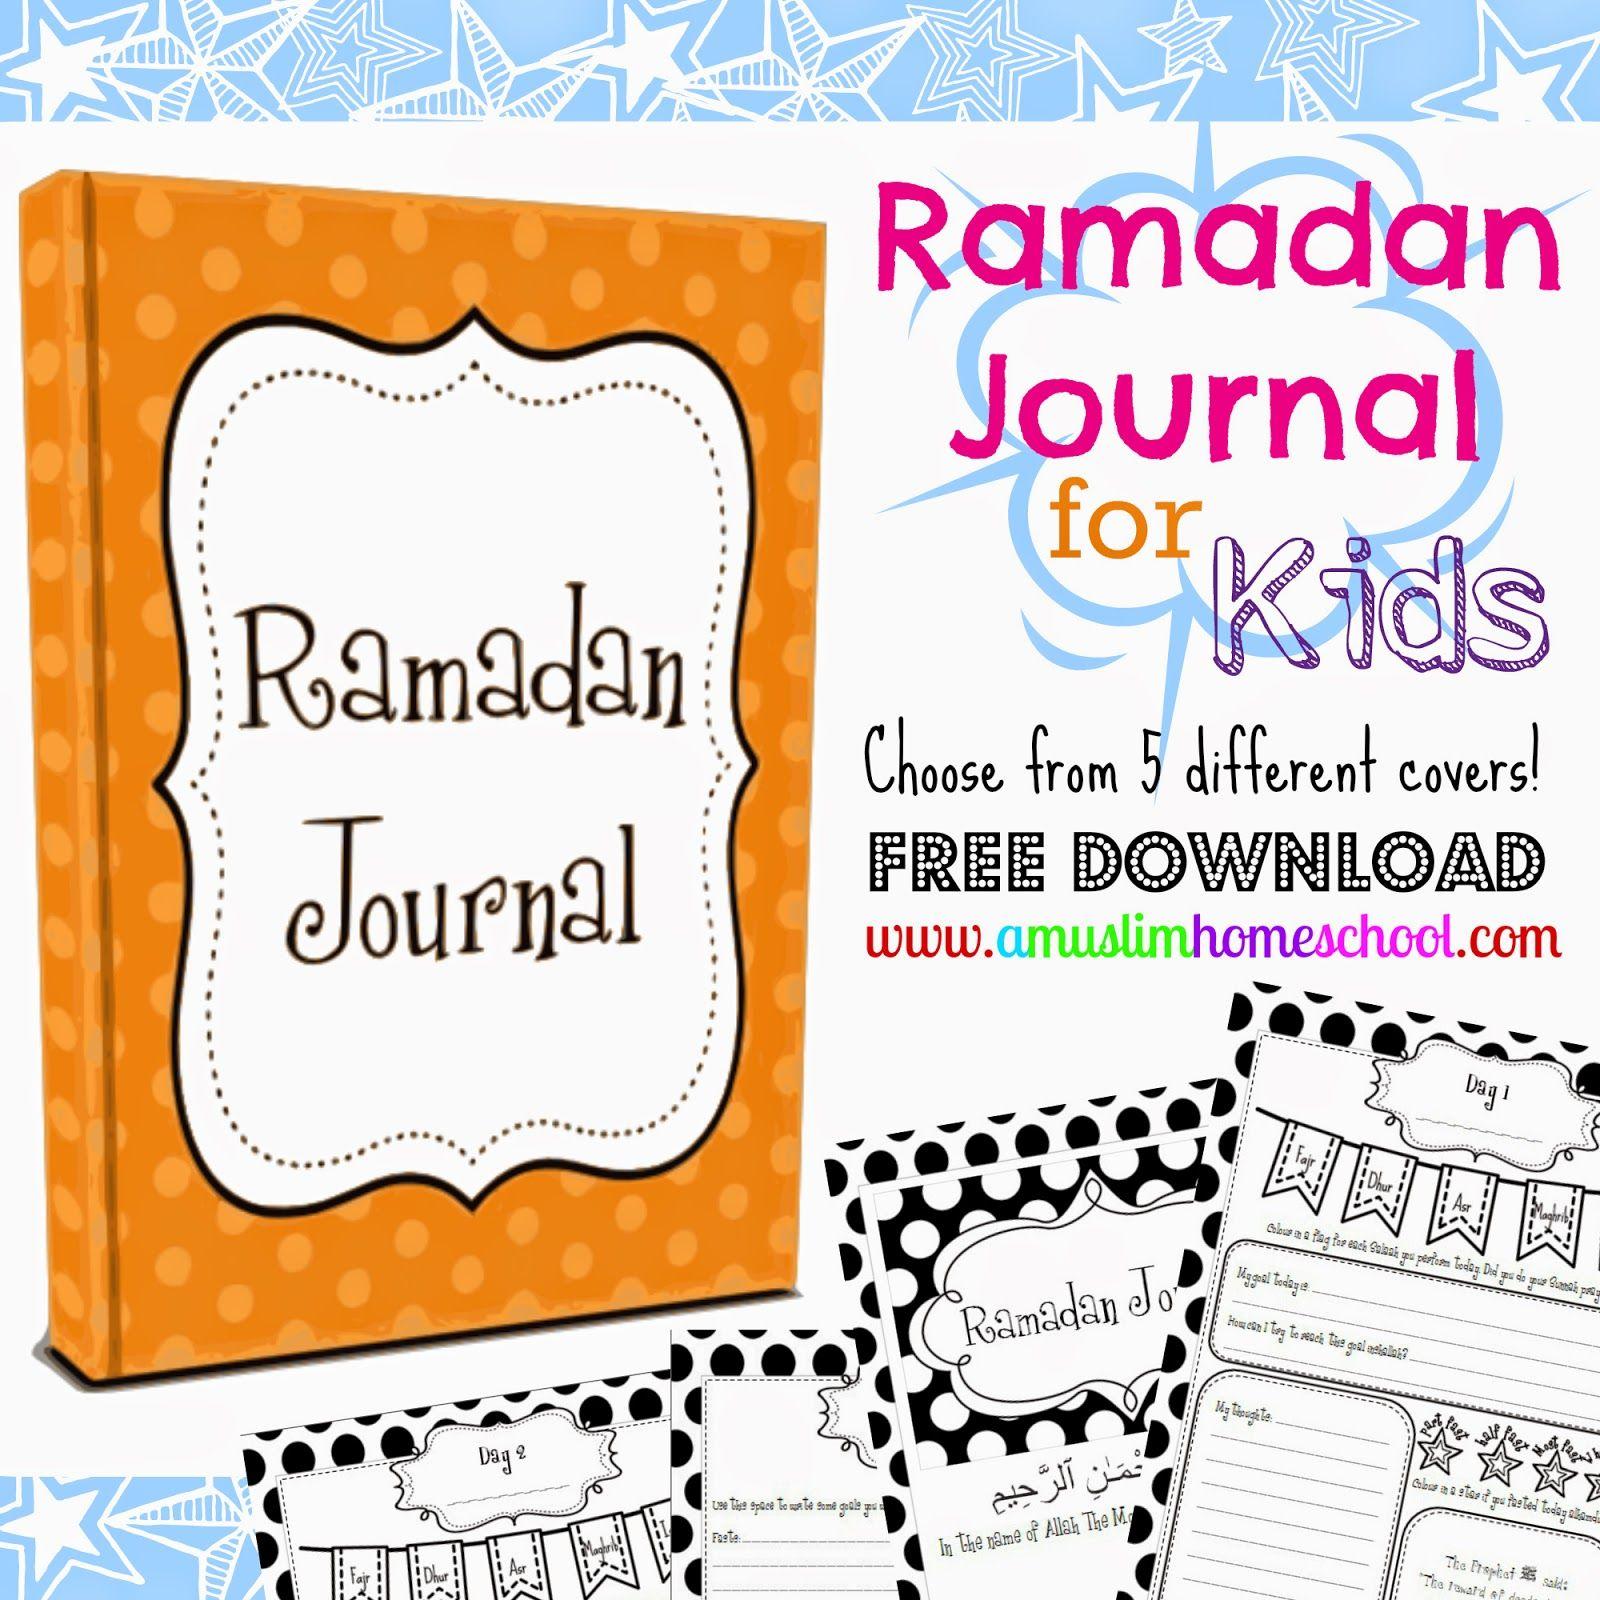 Kids Ramadan Journal Download Ramadan